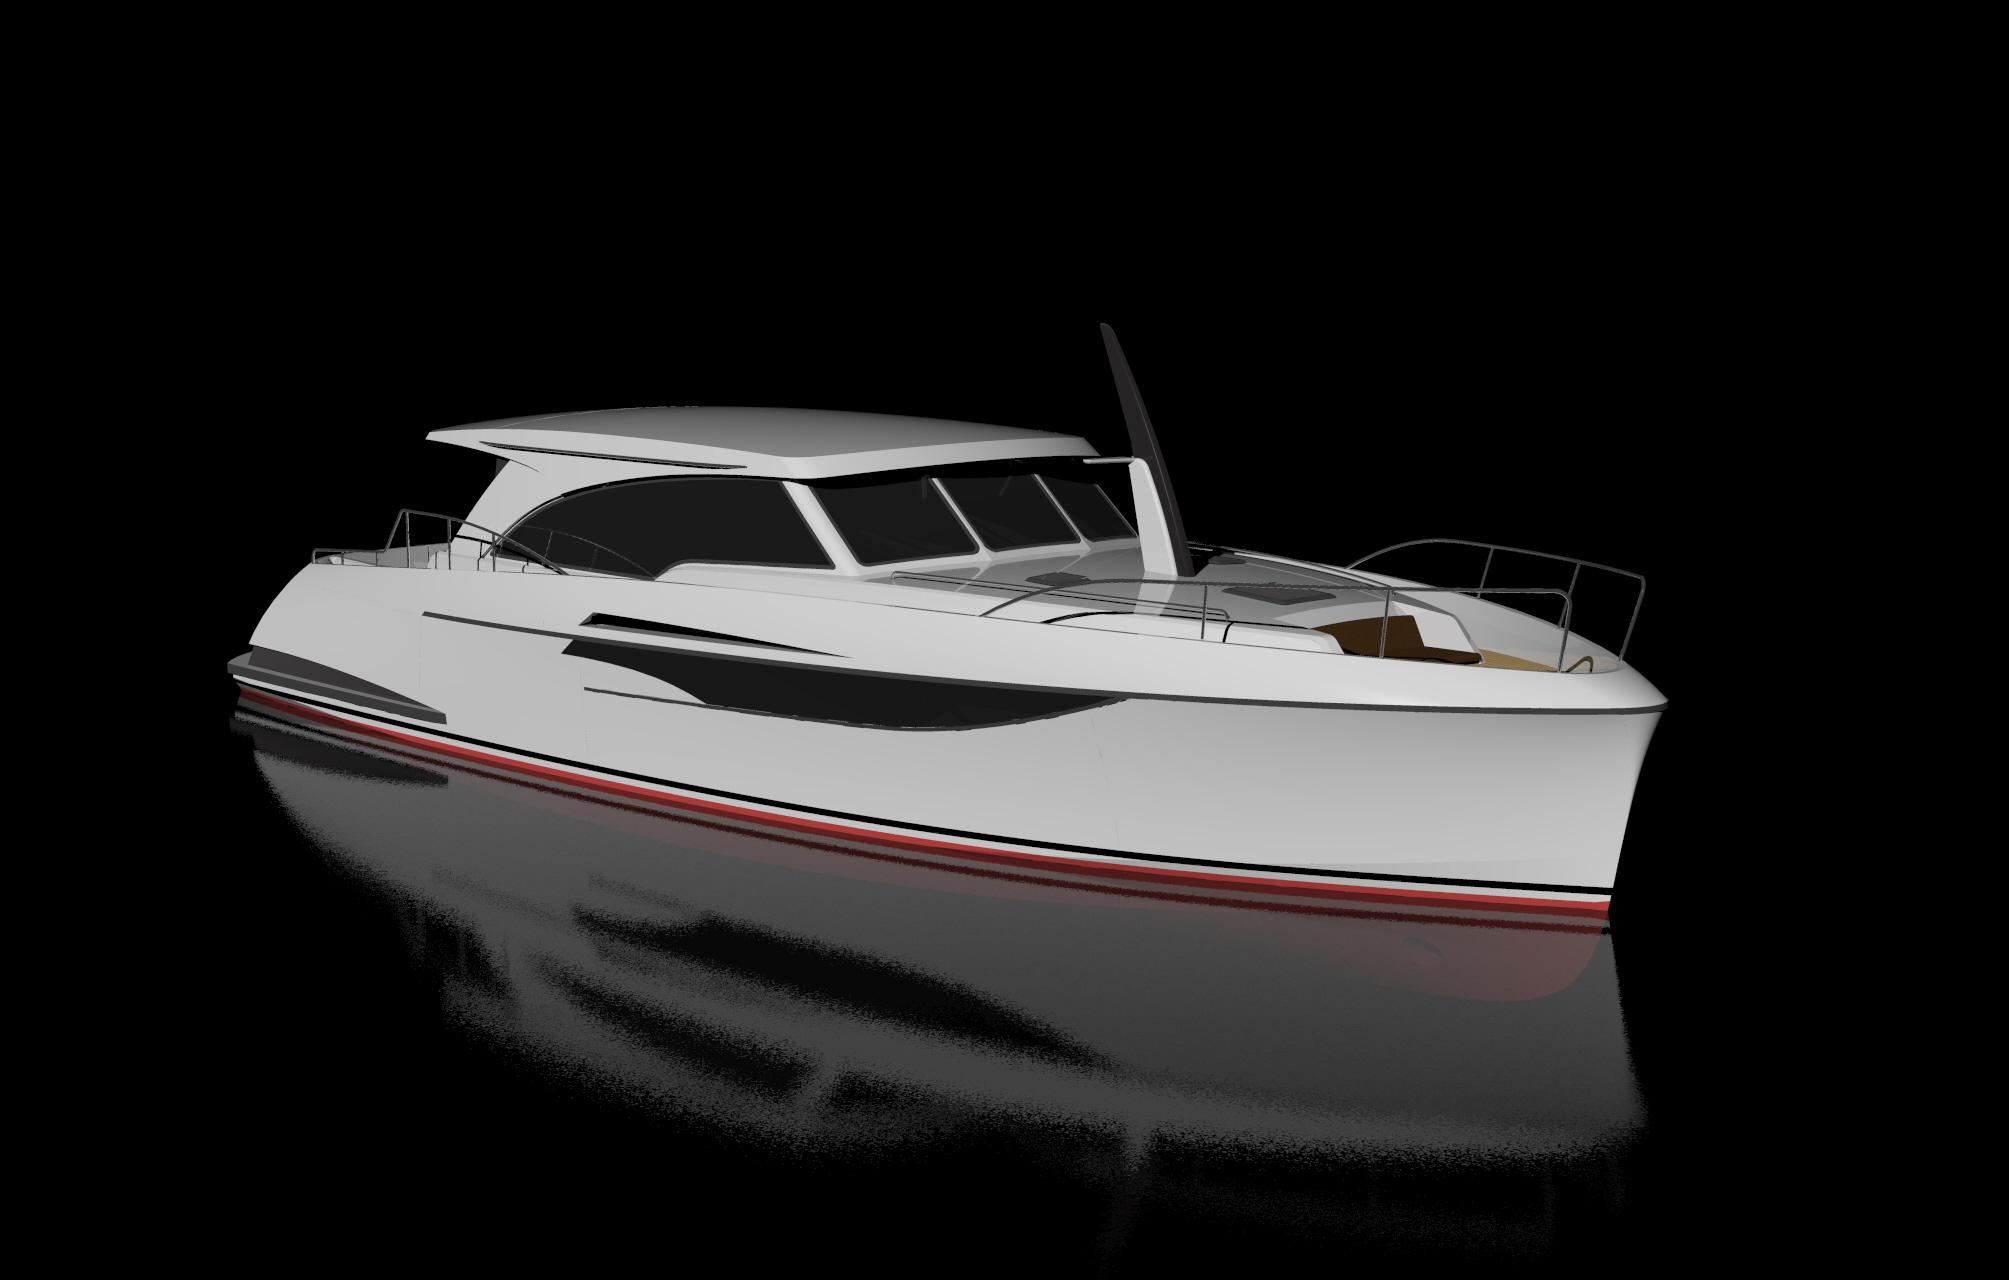 14m motoryacht rw yachtdesign for Yacht dekoration